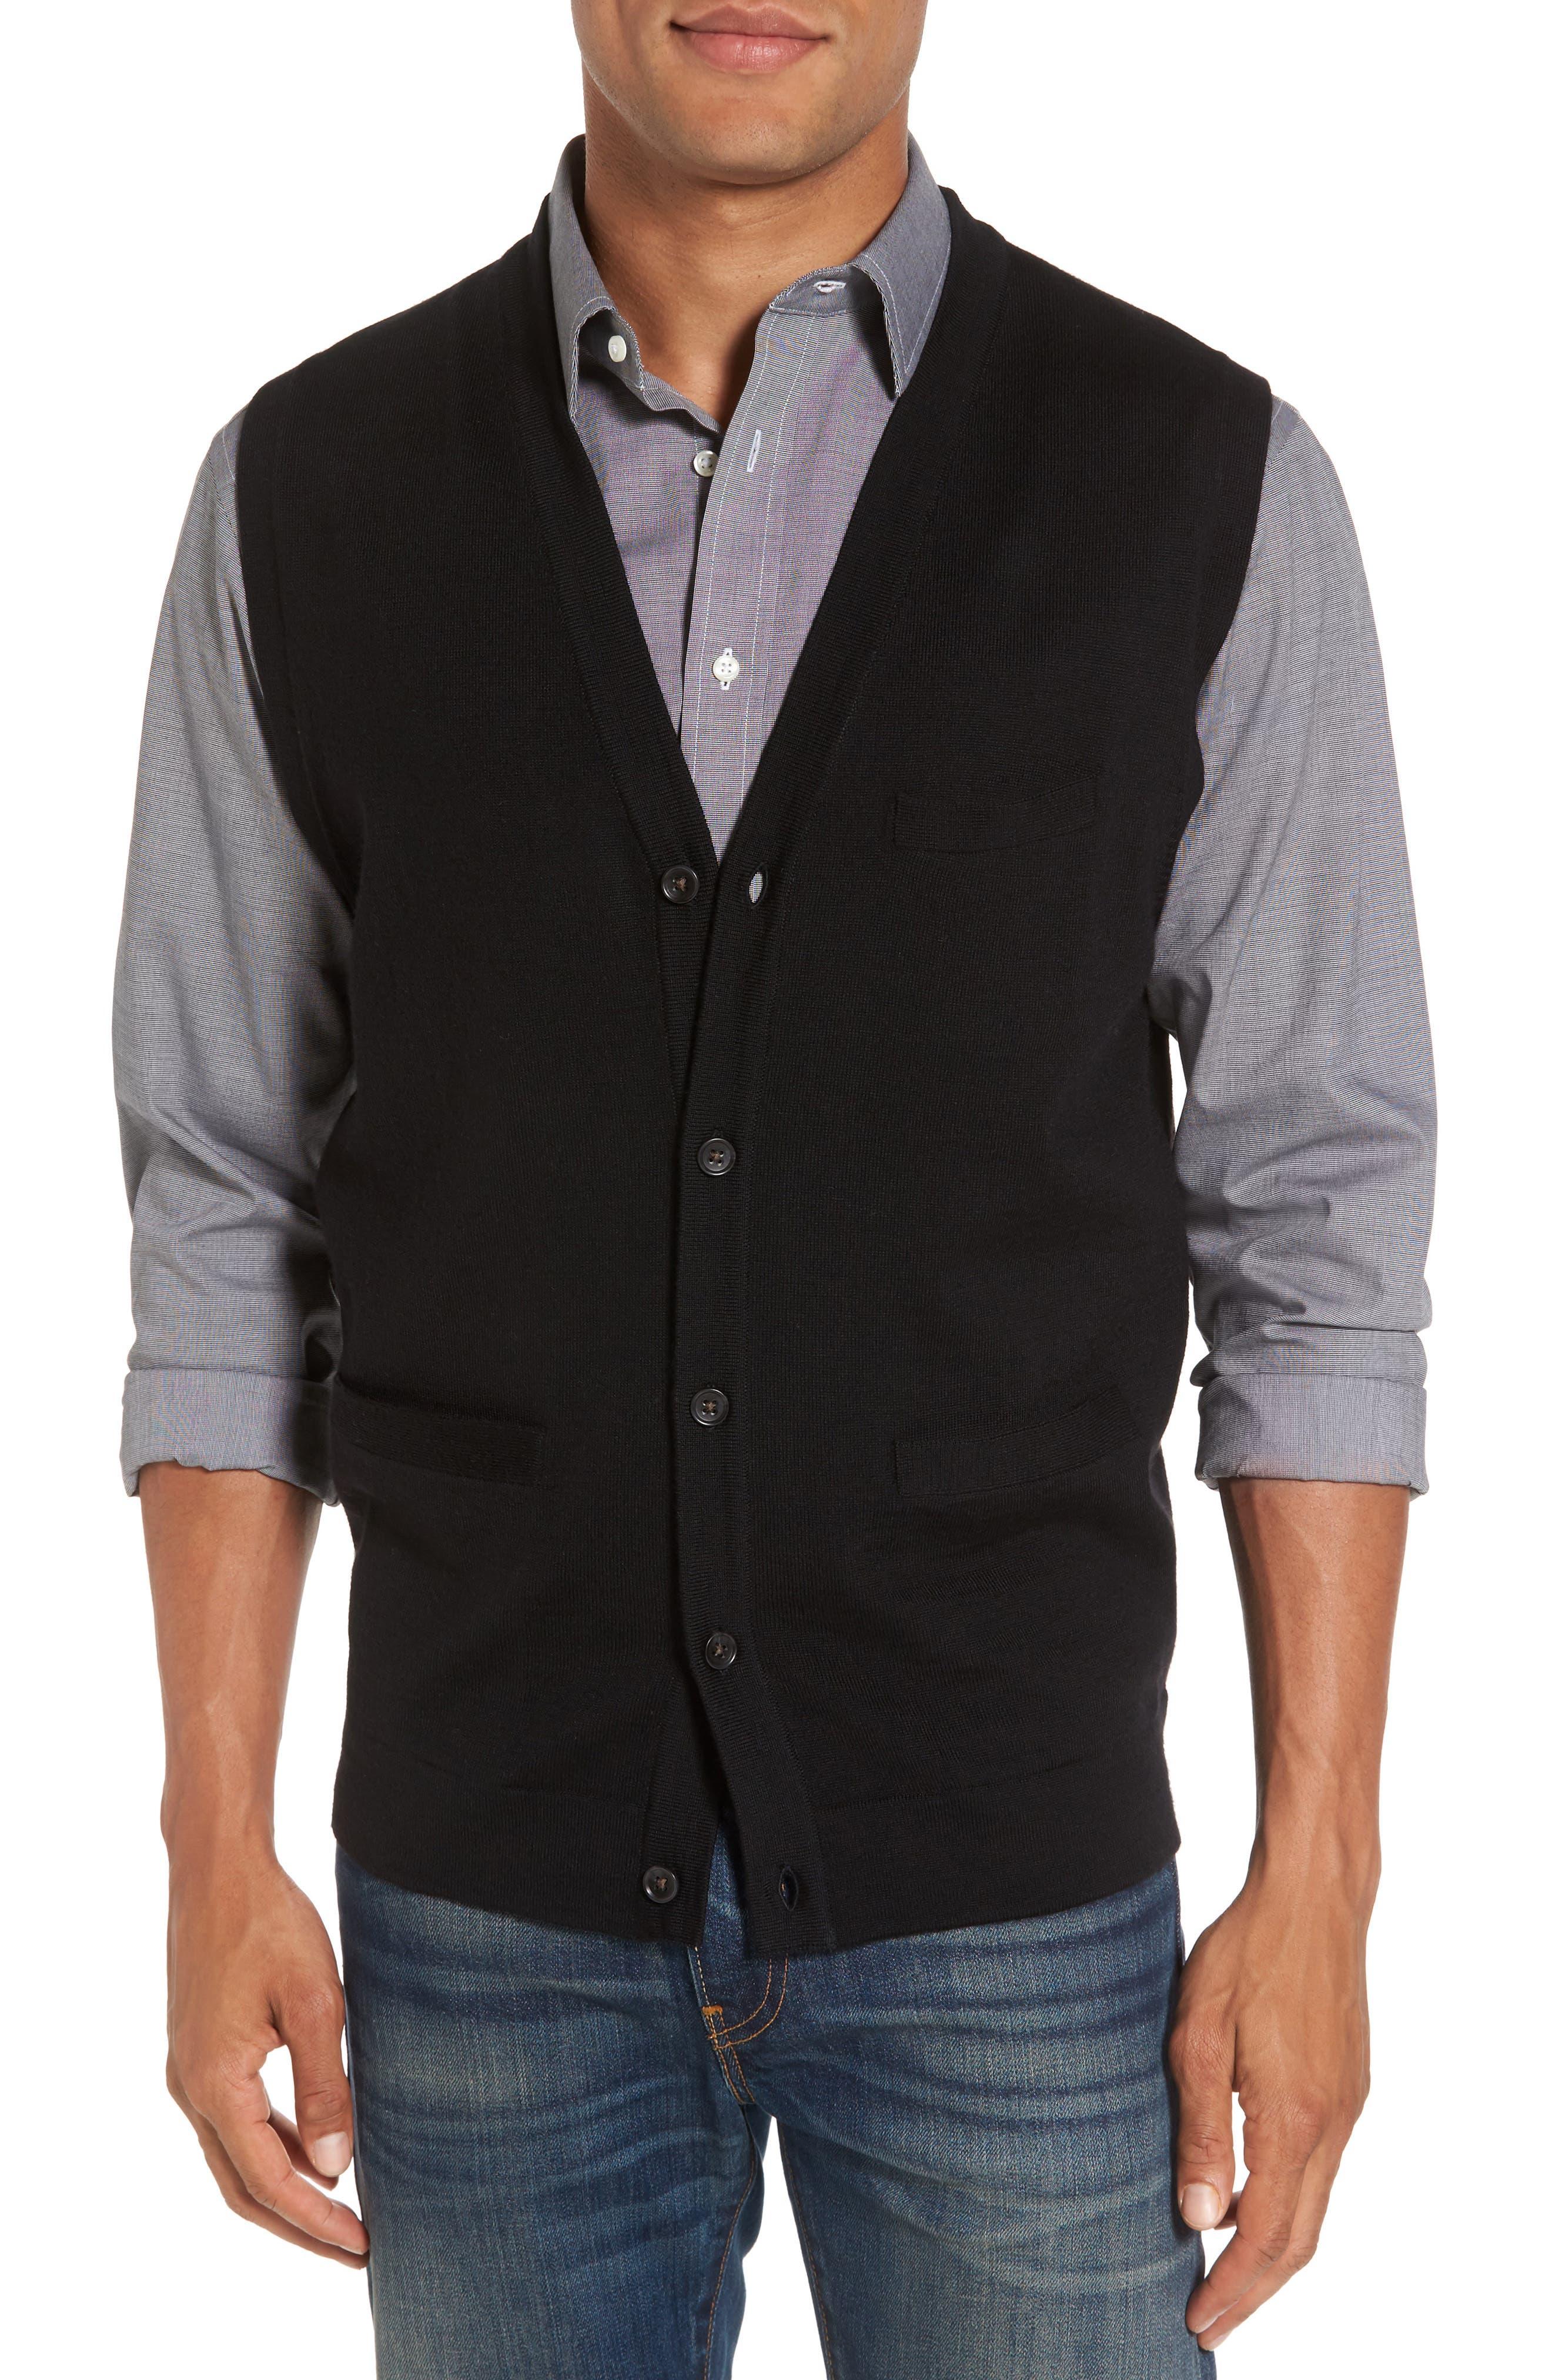 Main Image - Nordstrom Men's Shop Merino Button Front Sweater Vest